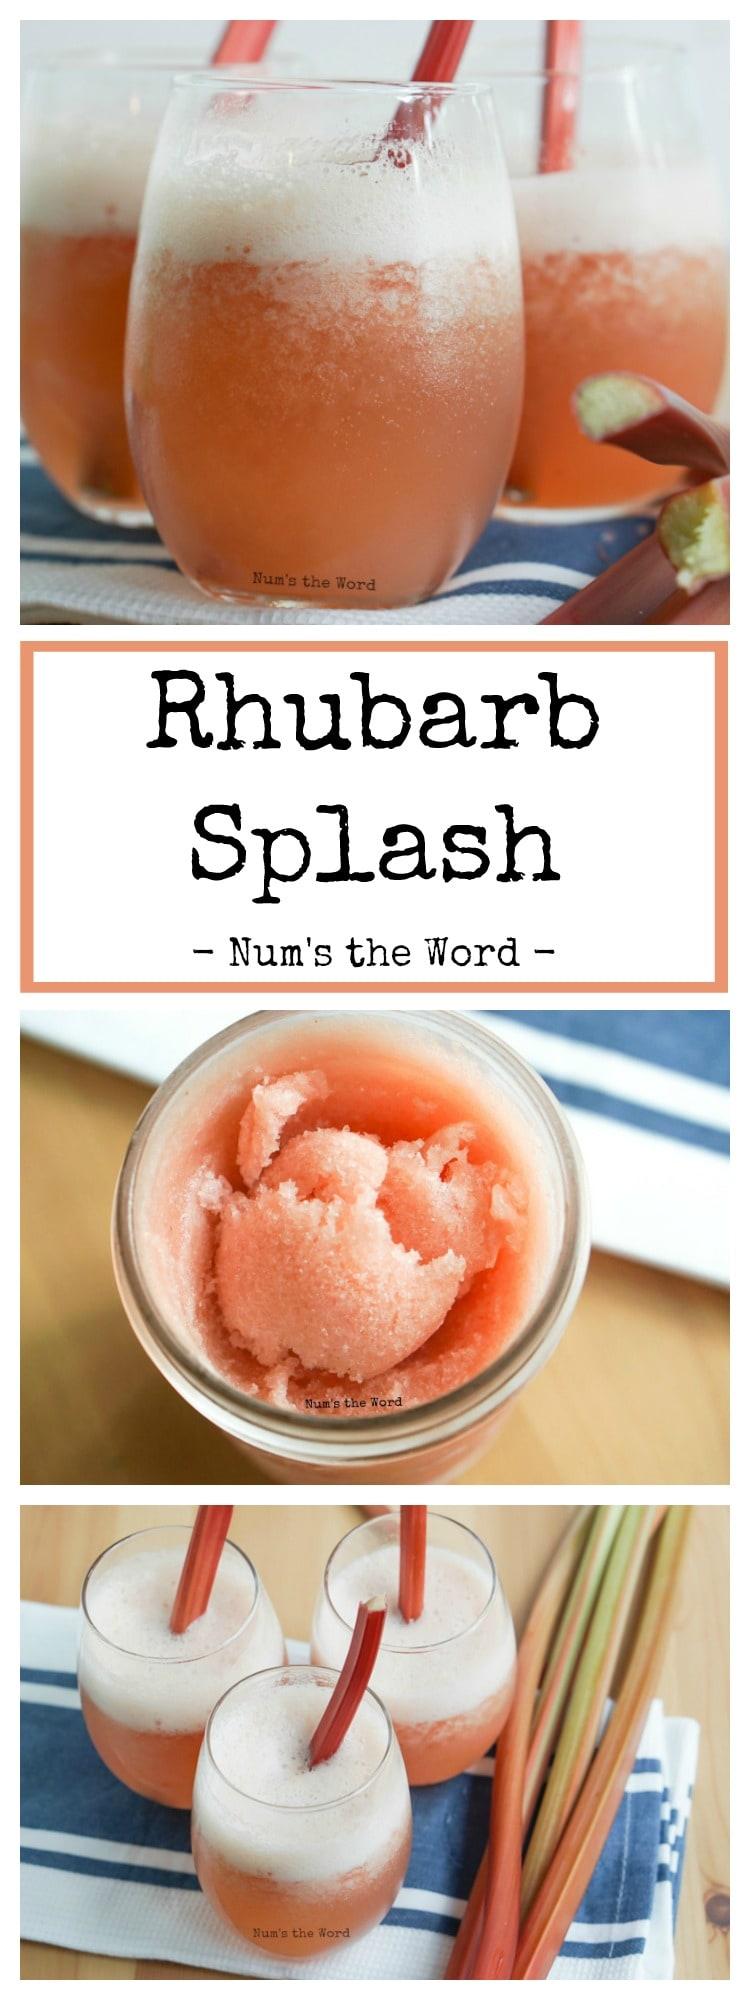 Rhubarb Splash